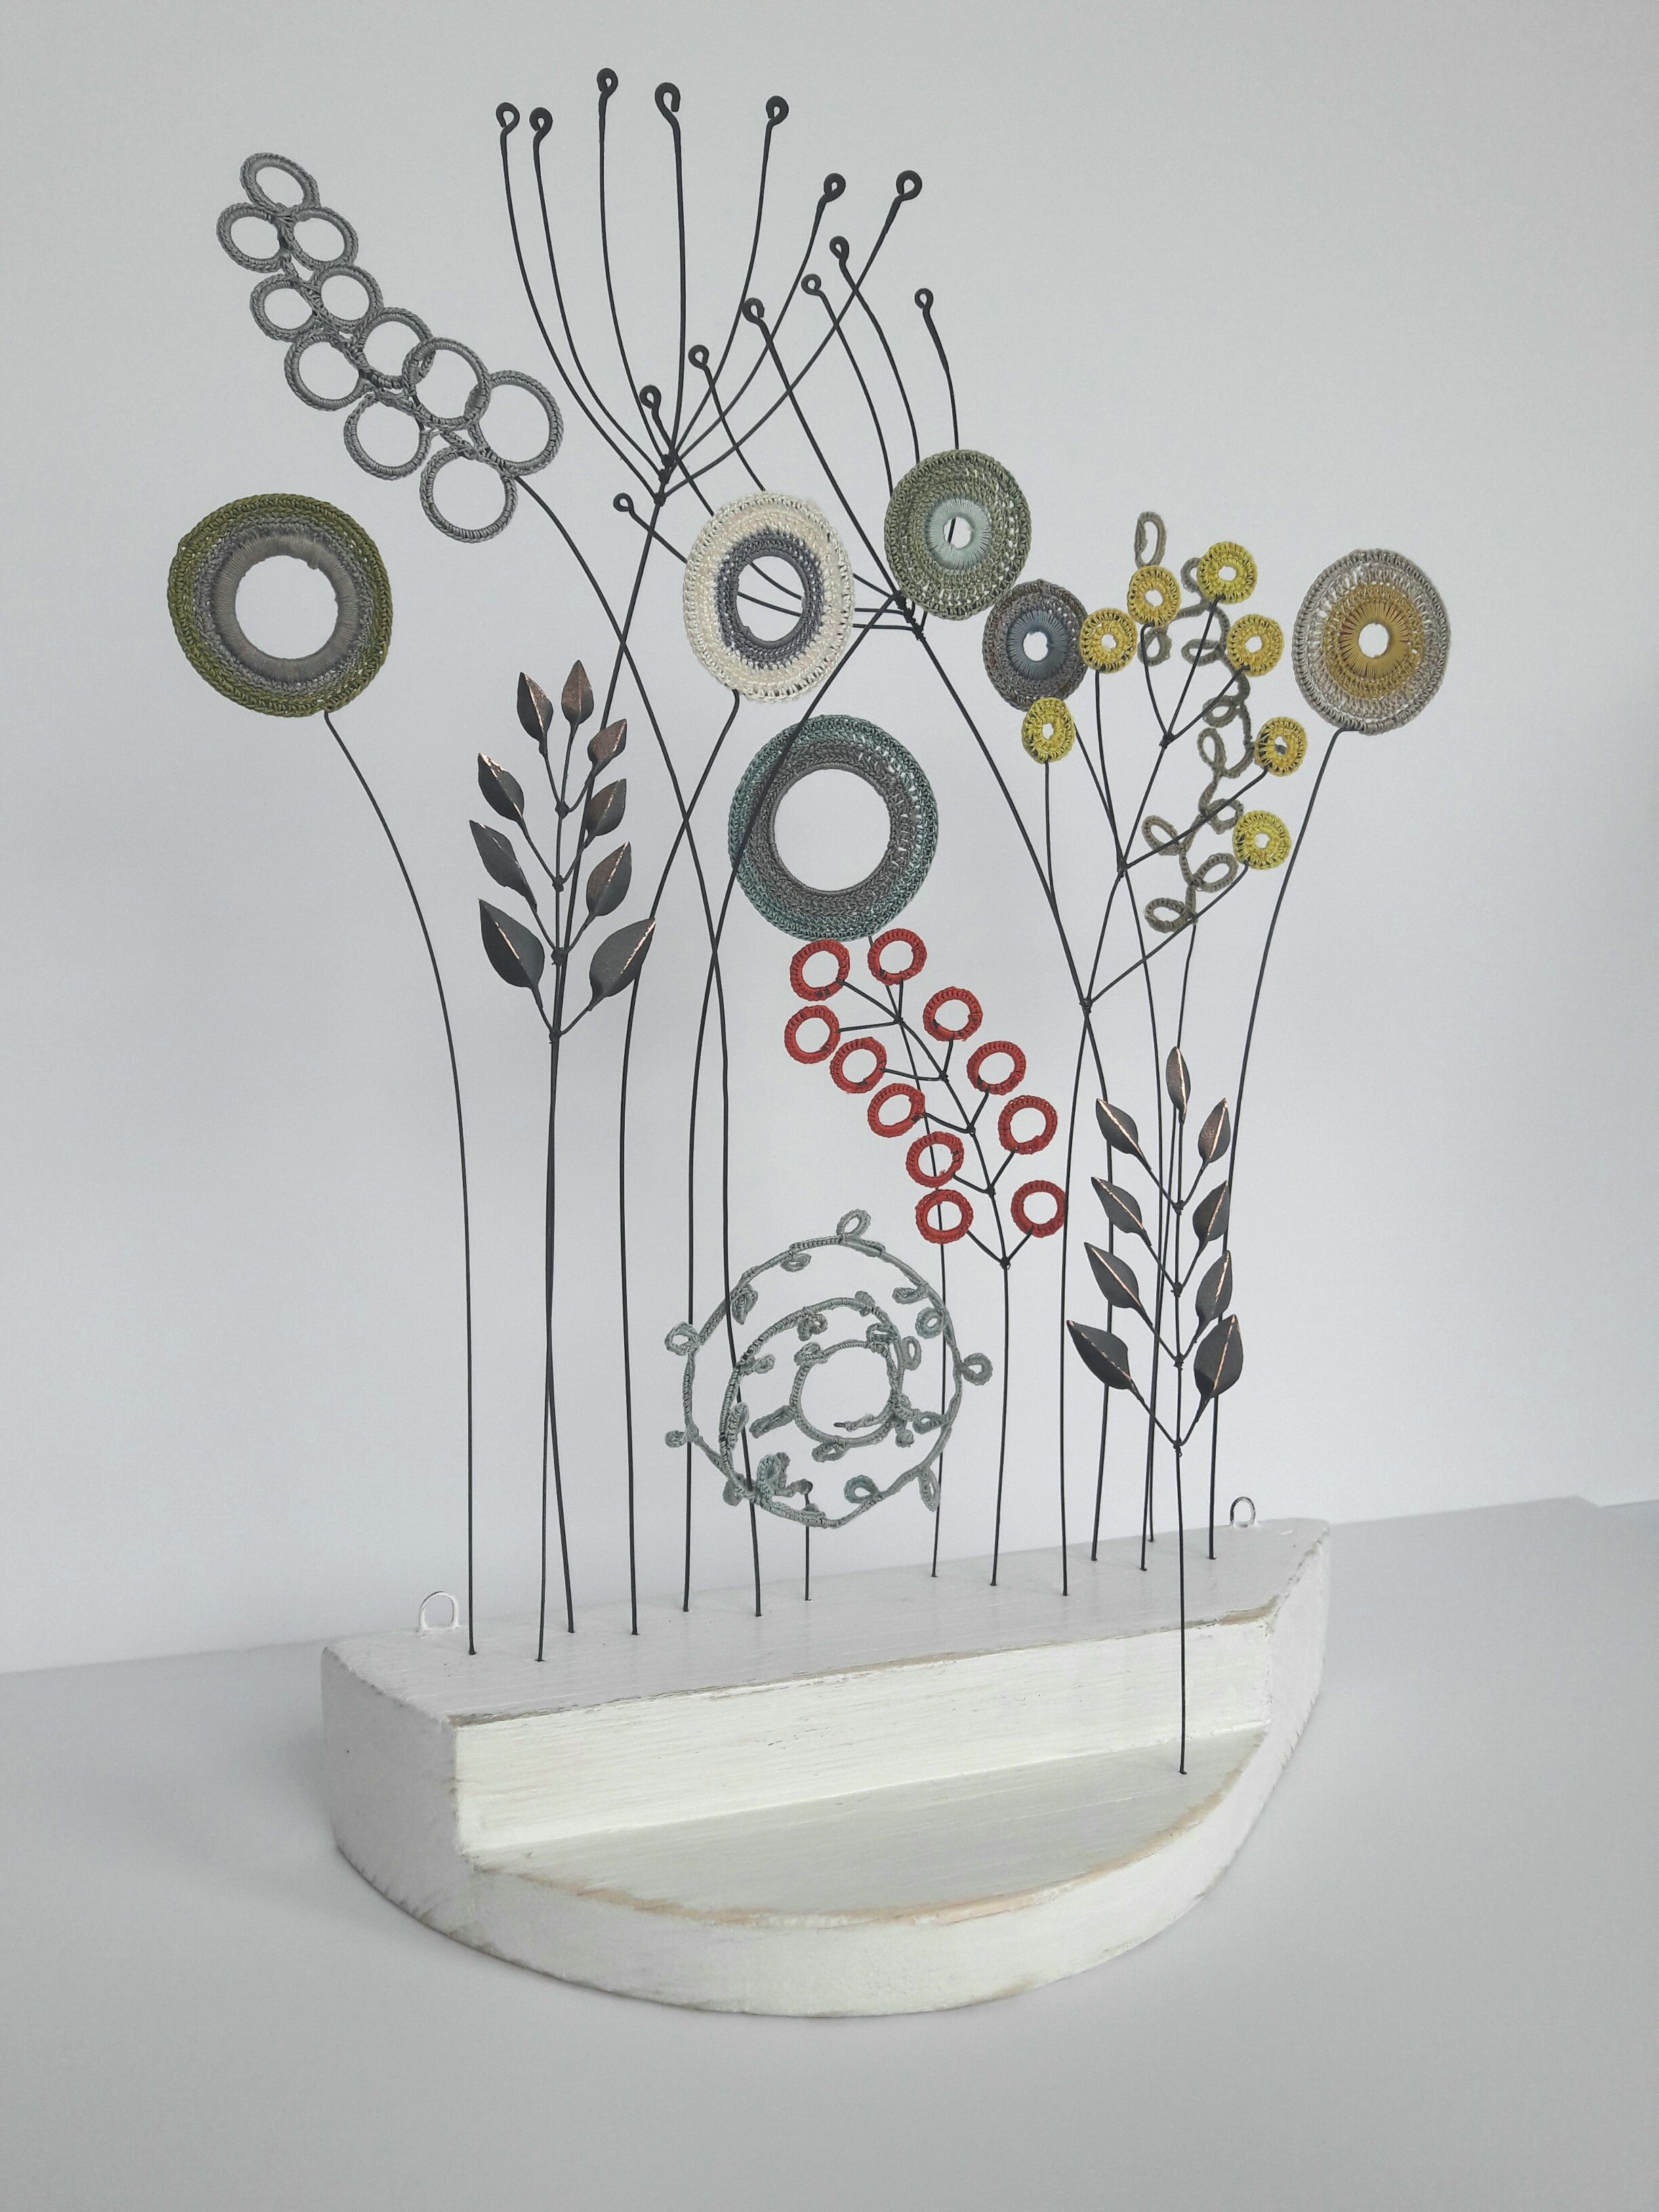 Liz Cooksey - Mixed Bed crochet & wire   Liz Cooksey   Pinterest ...